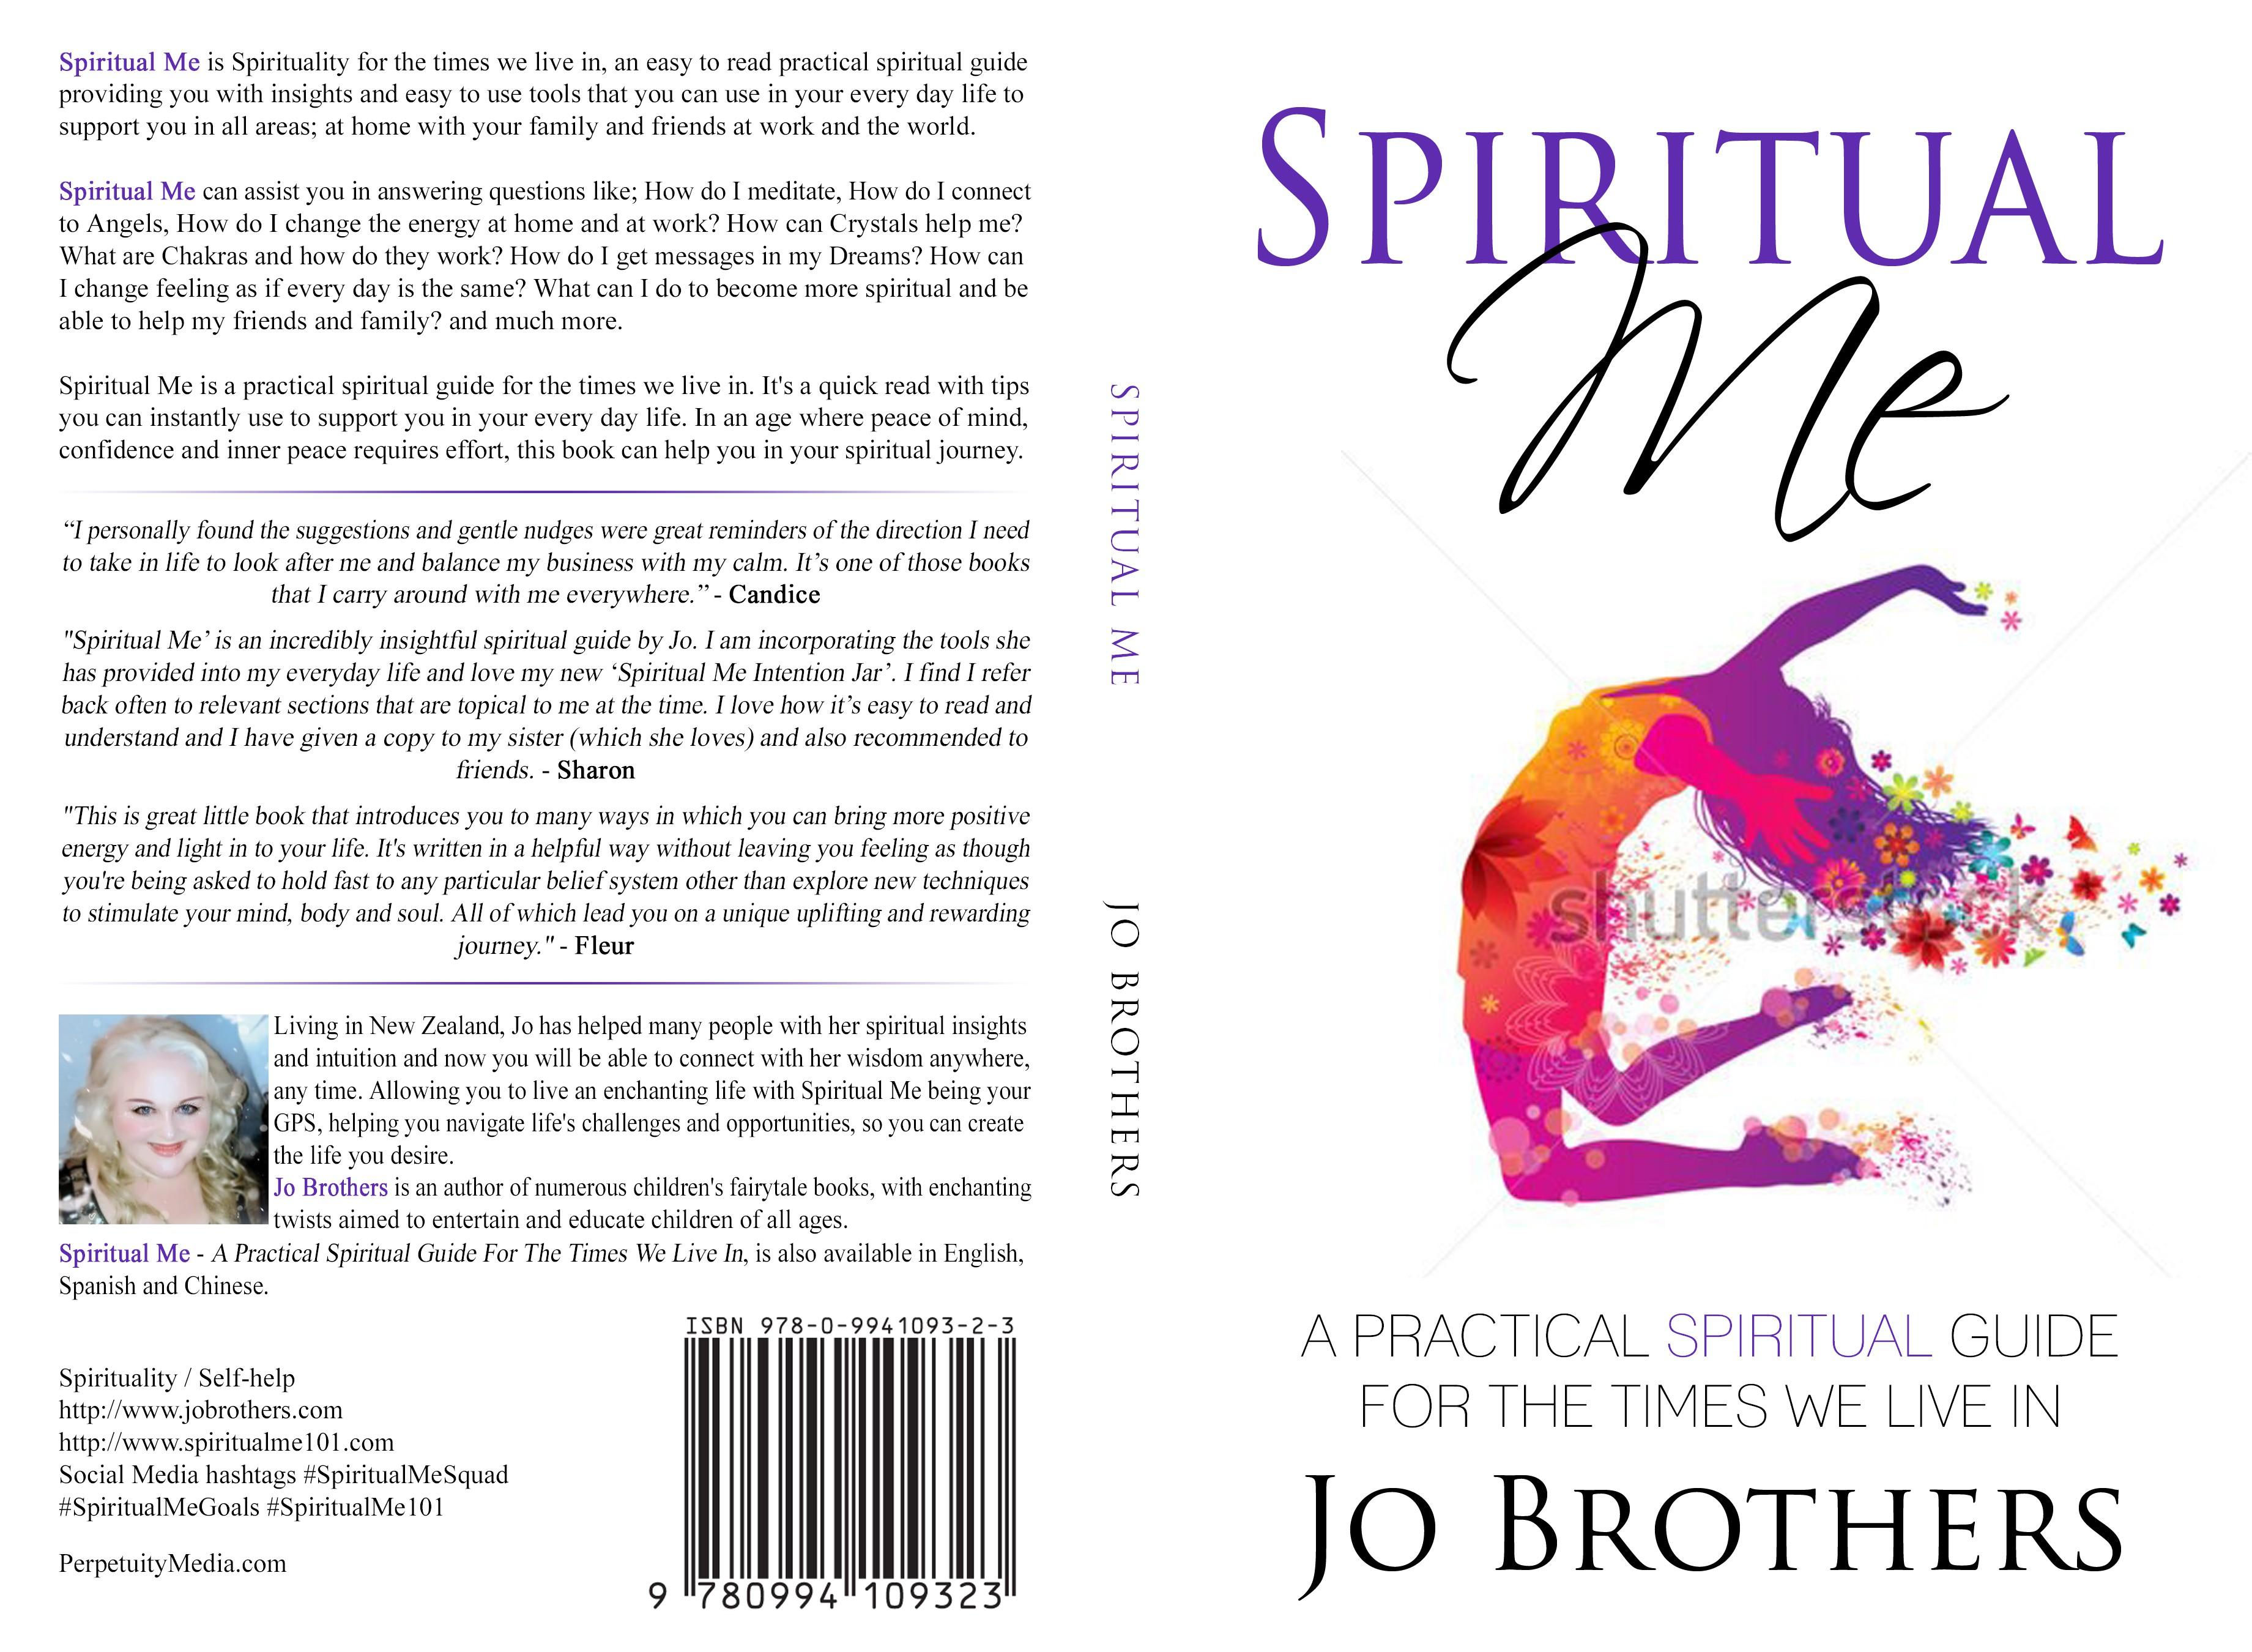 Spiritual Me - Design a new book cover for us!